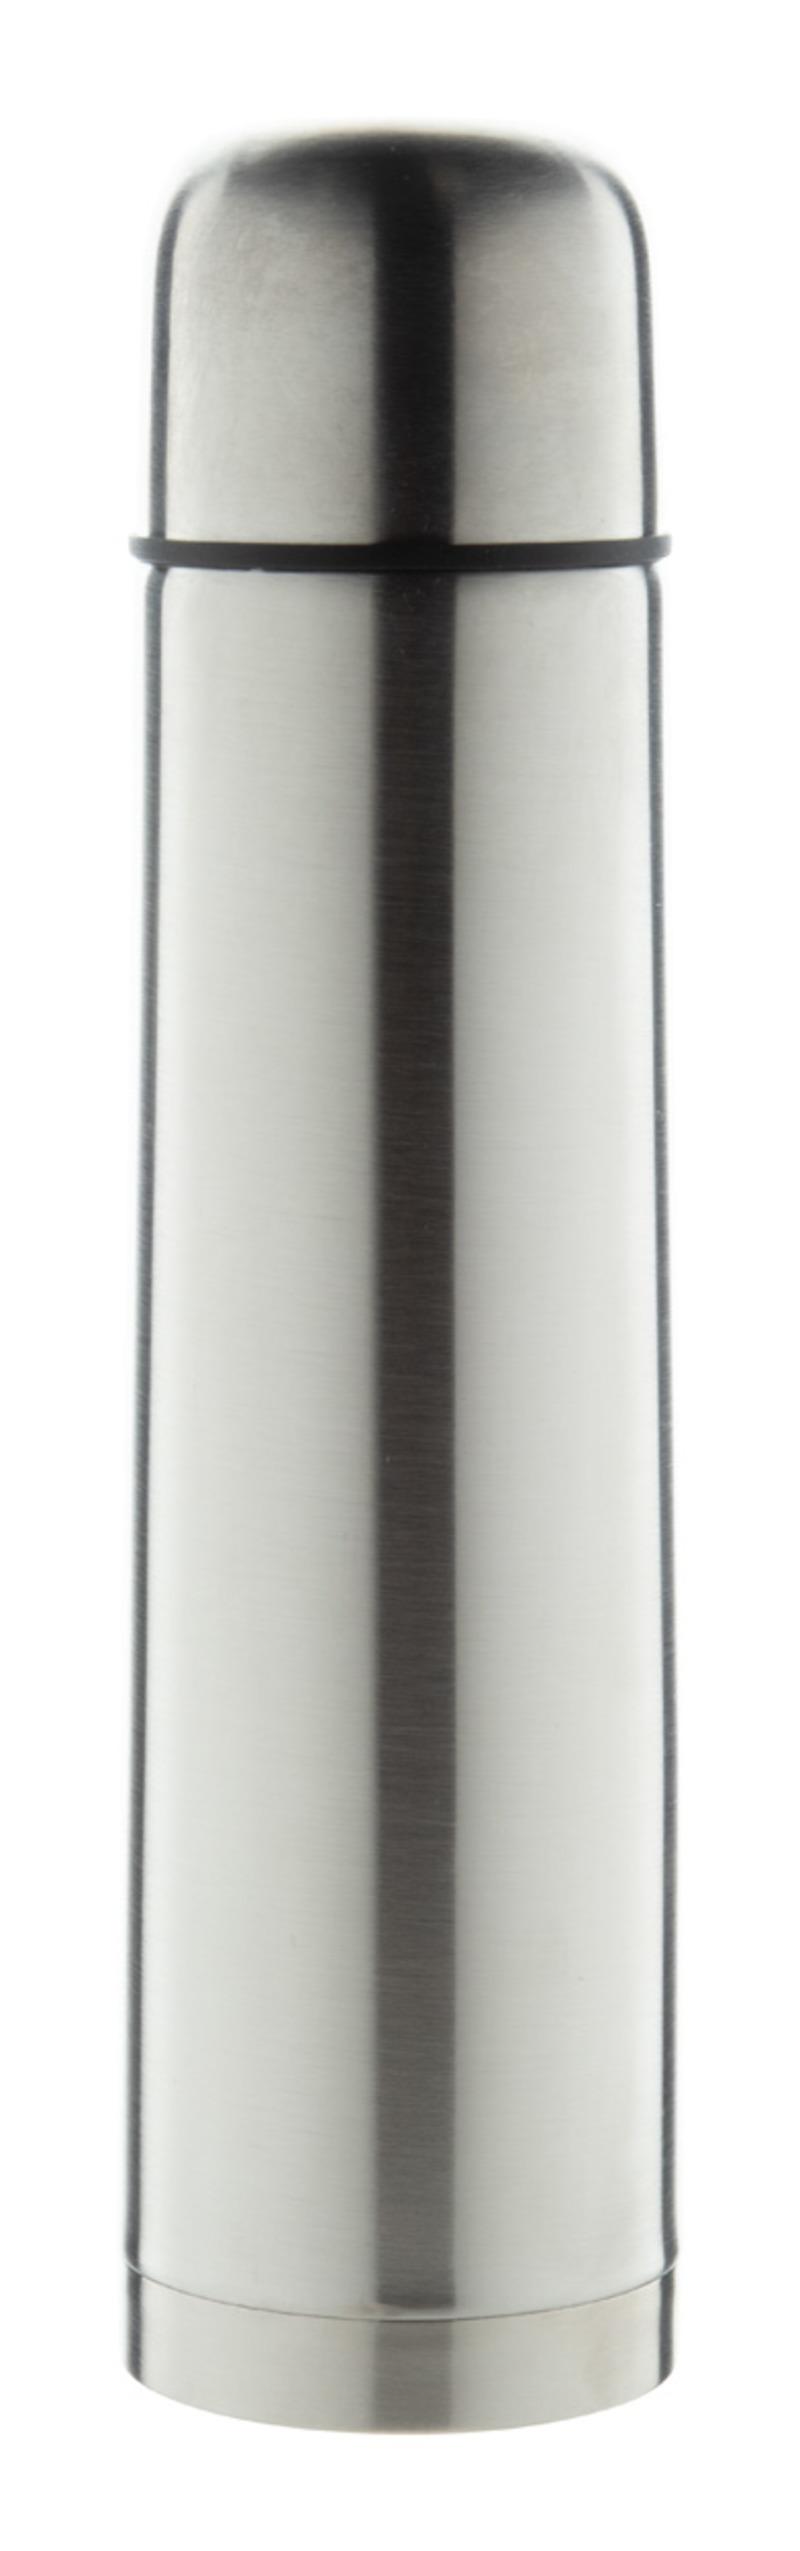 Robusta XL vacuum flask